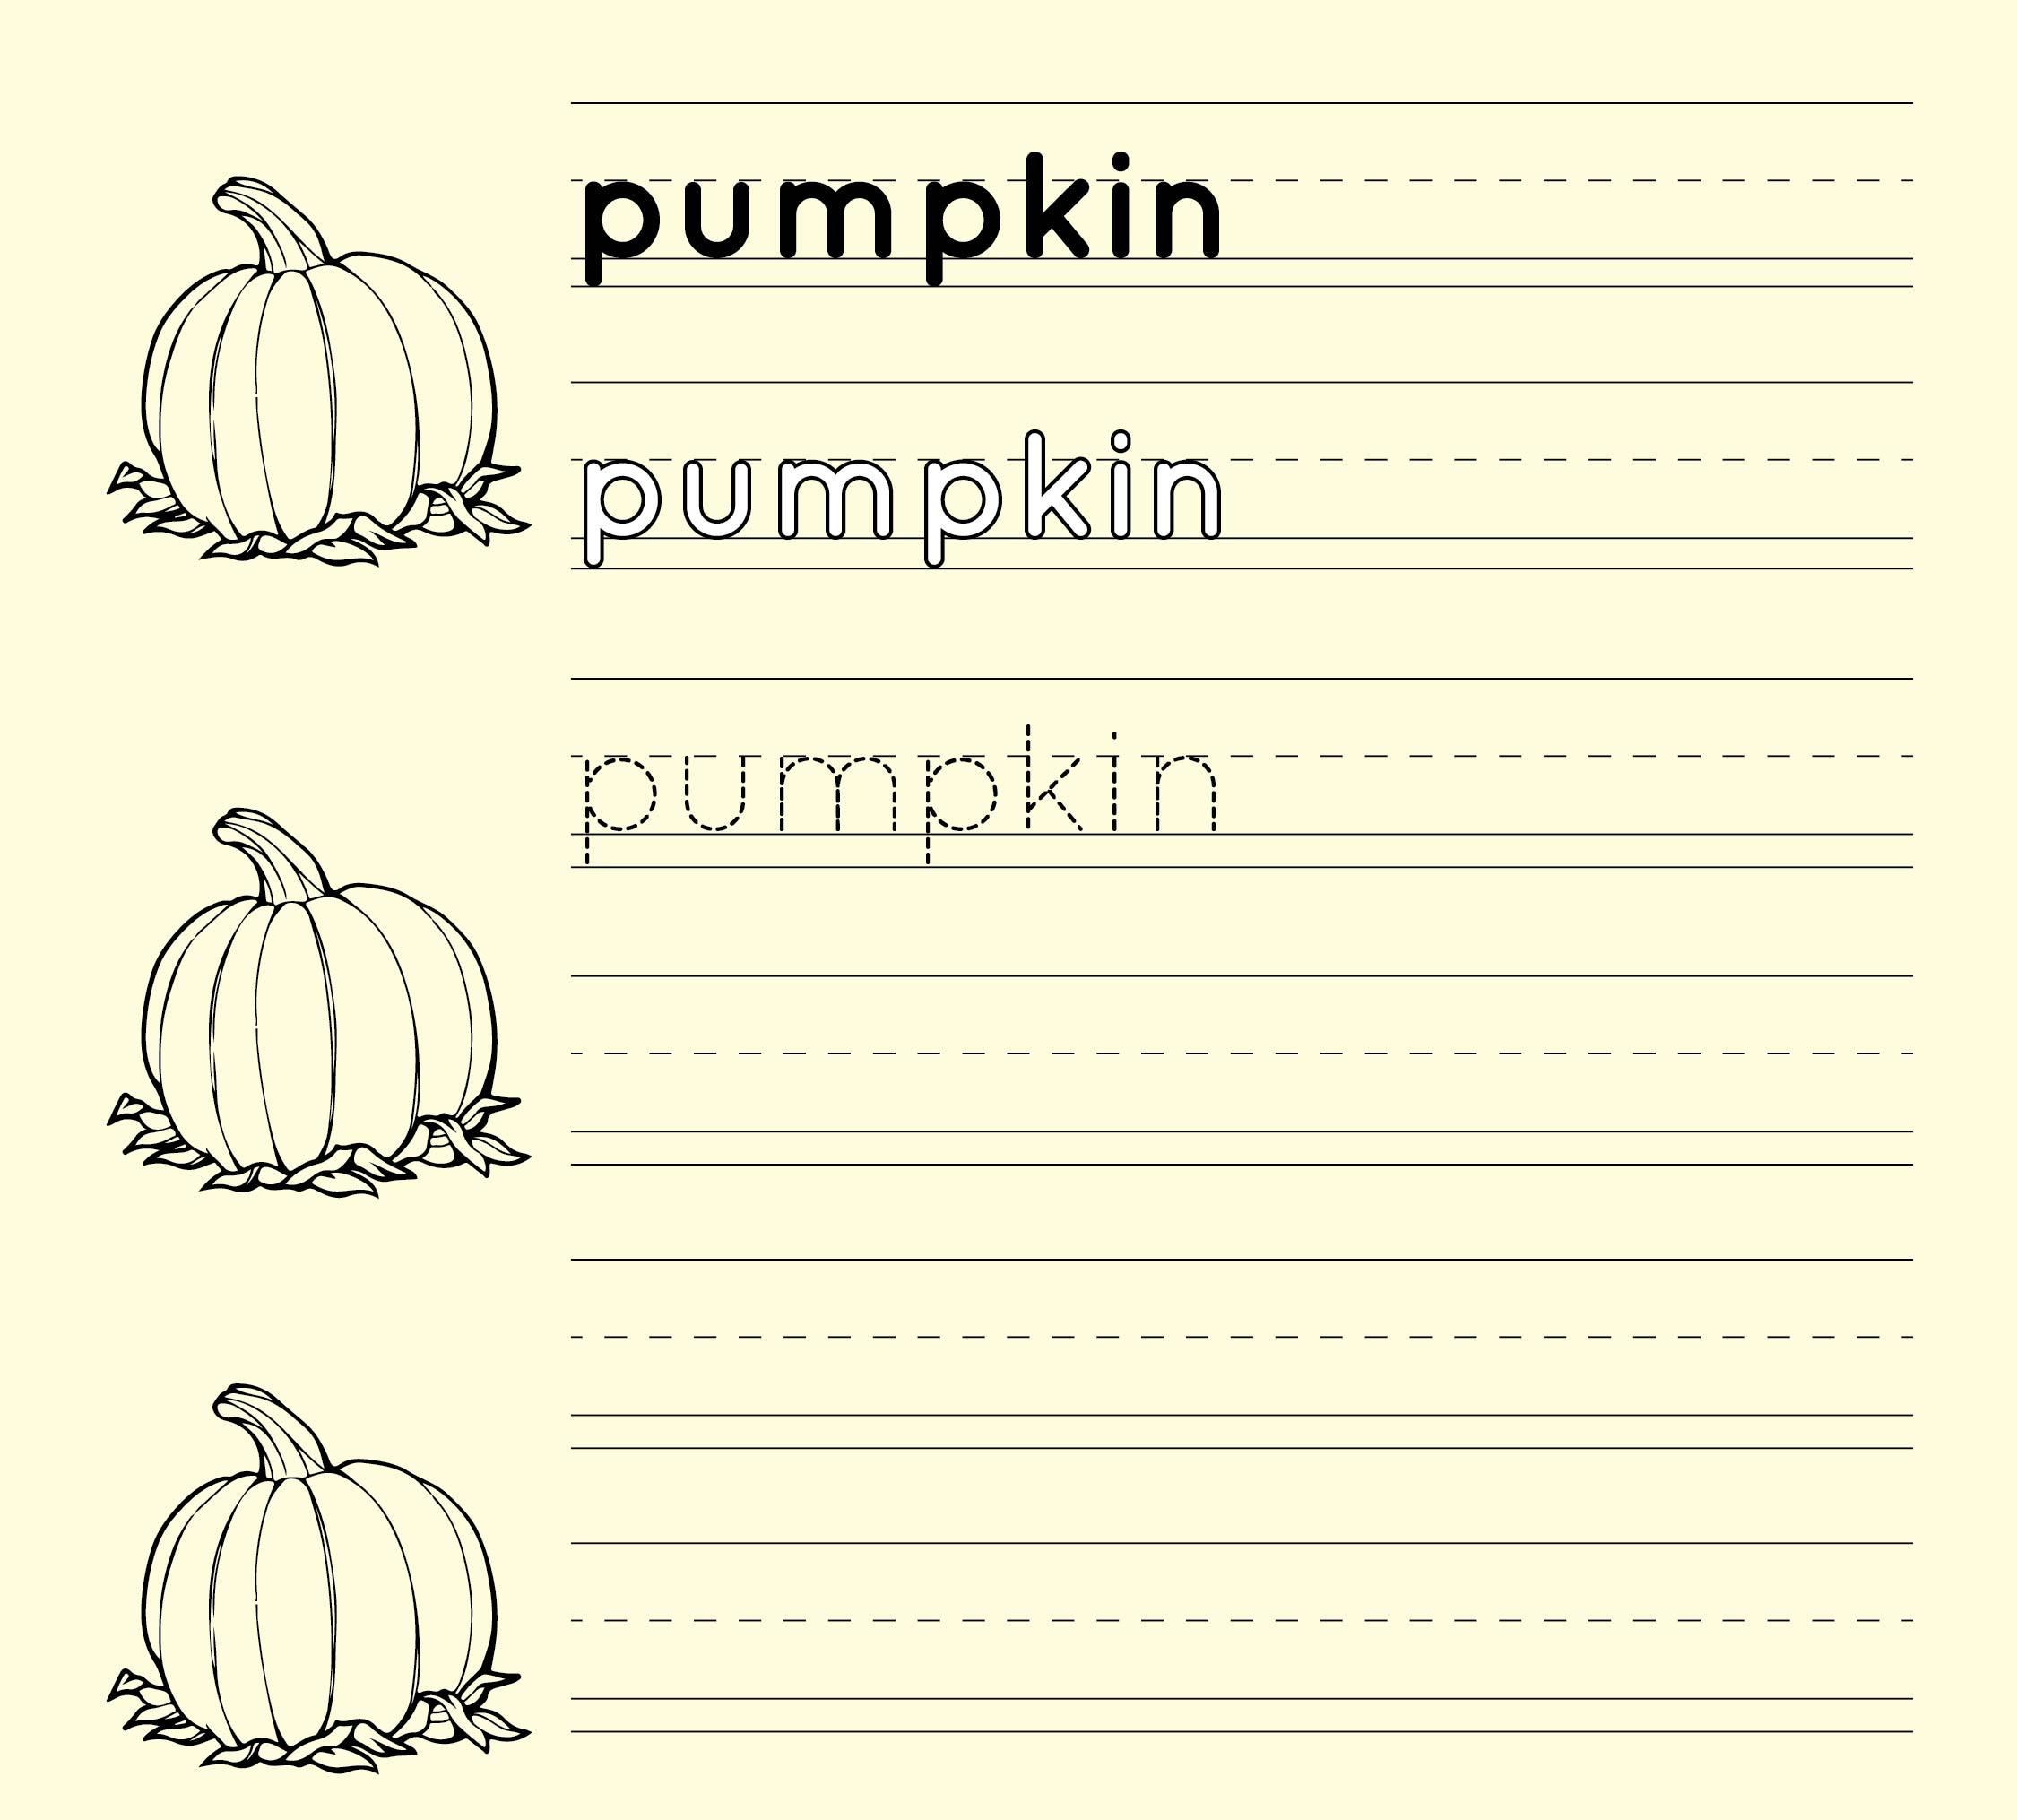 Pumpkin Handwriting Worksheet